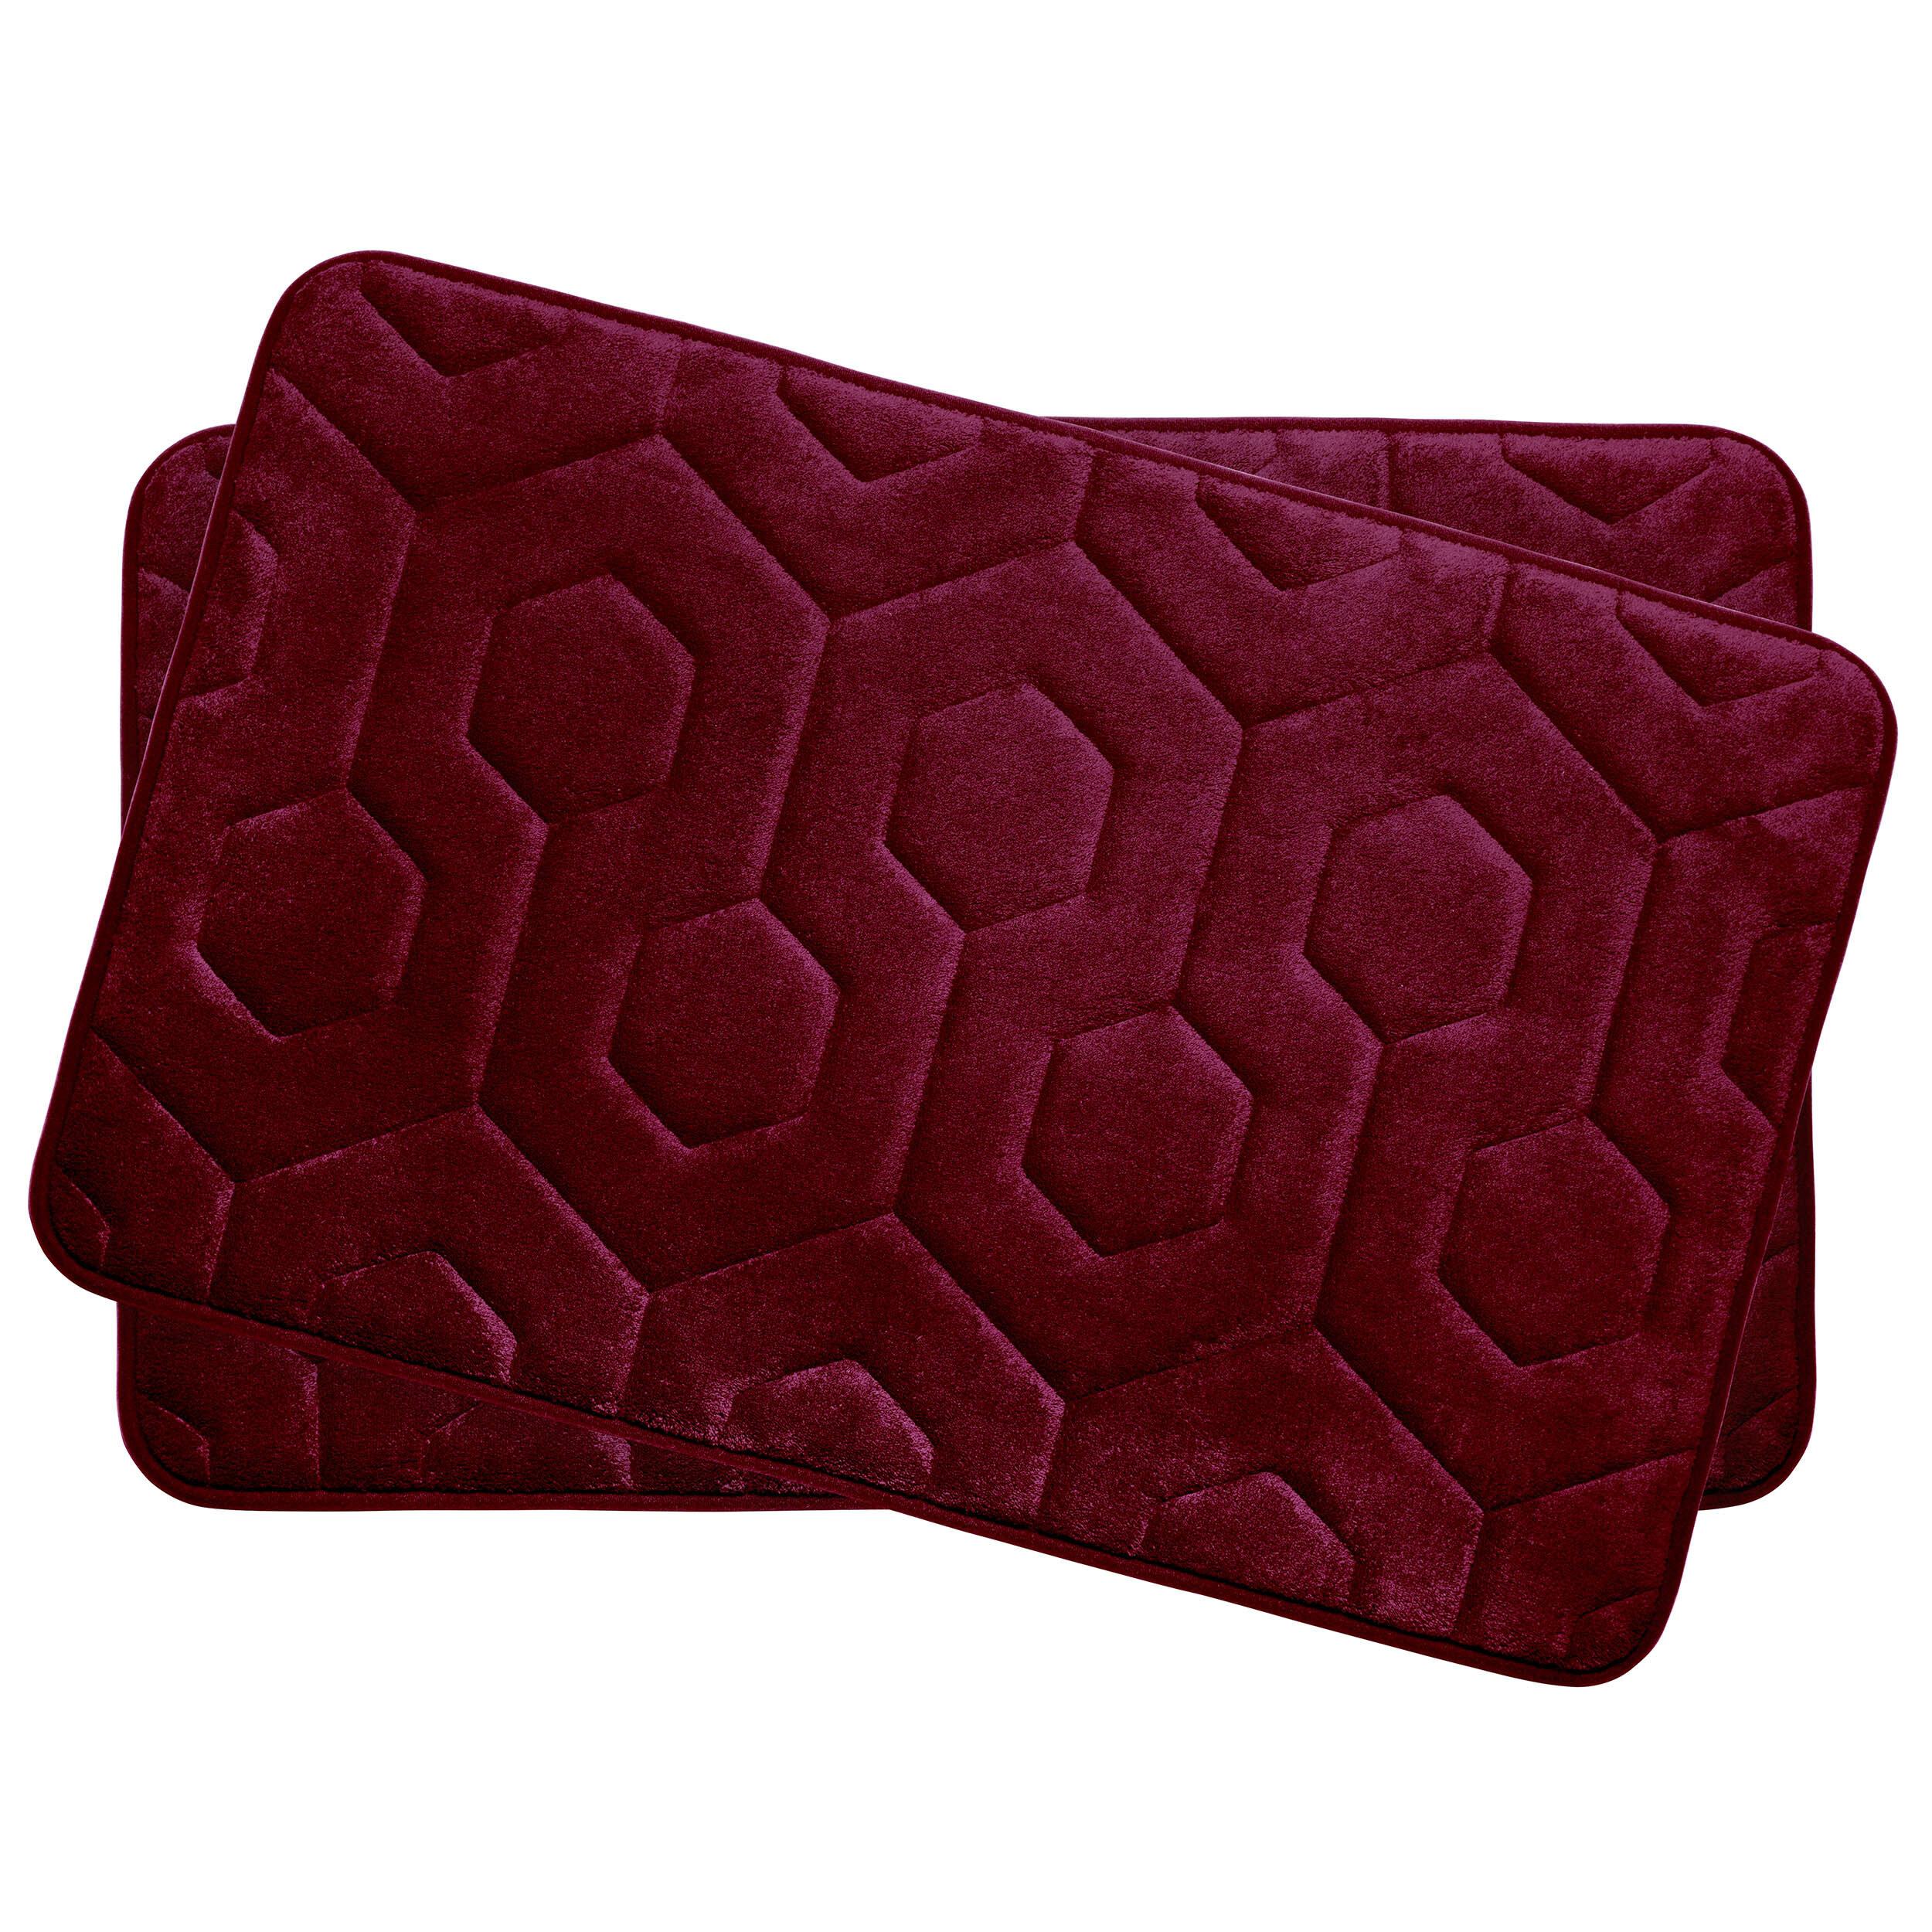 mats rug piece mat zebra purple slippery amazoncom bathroom anti l bamboo set bath w x